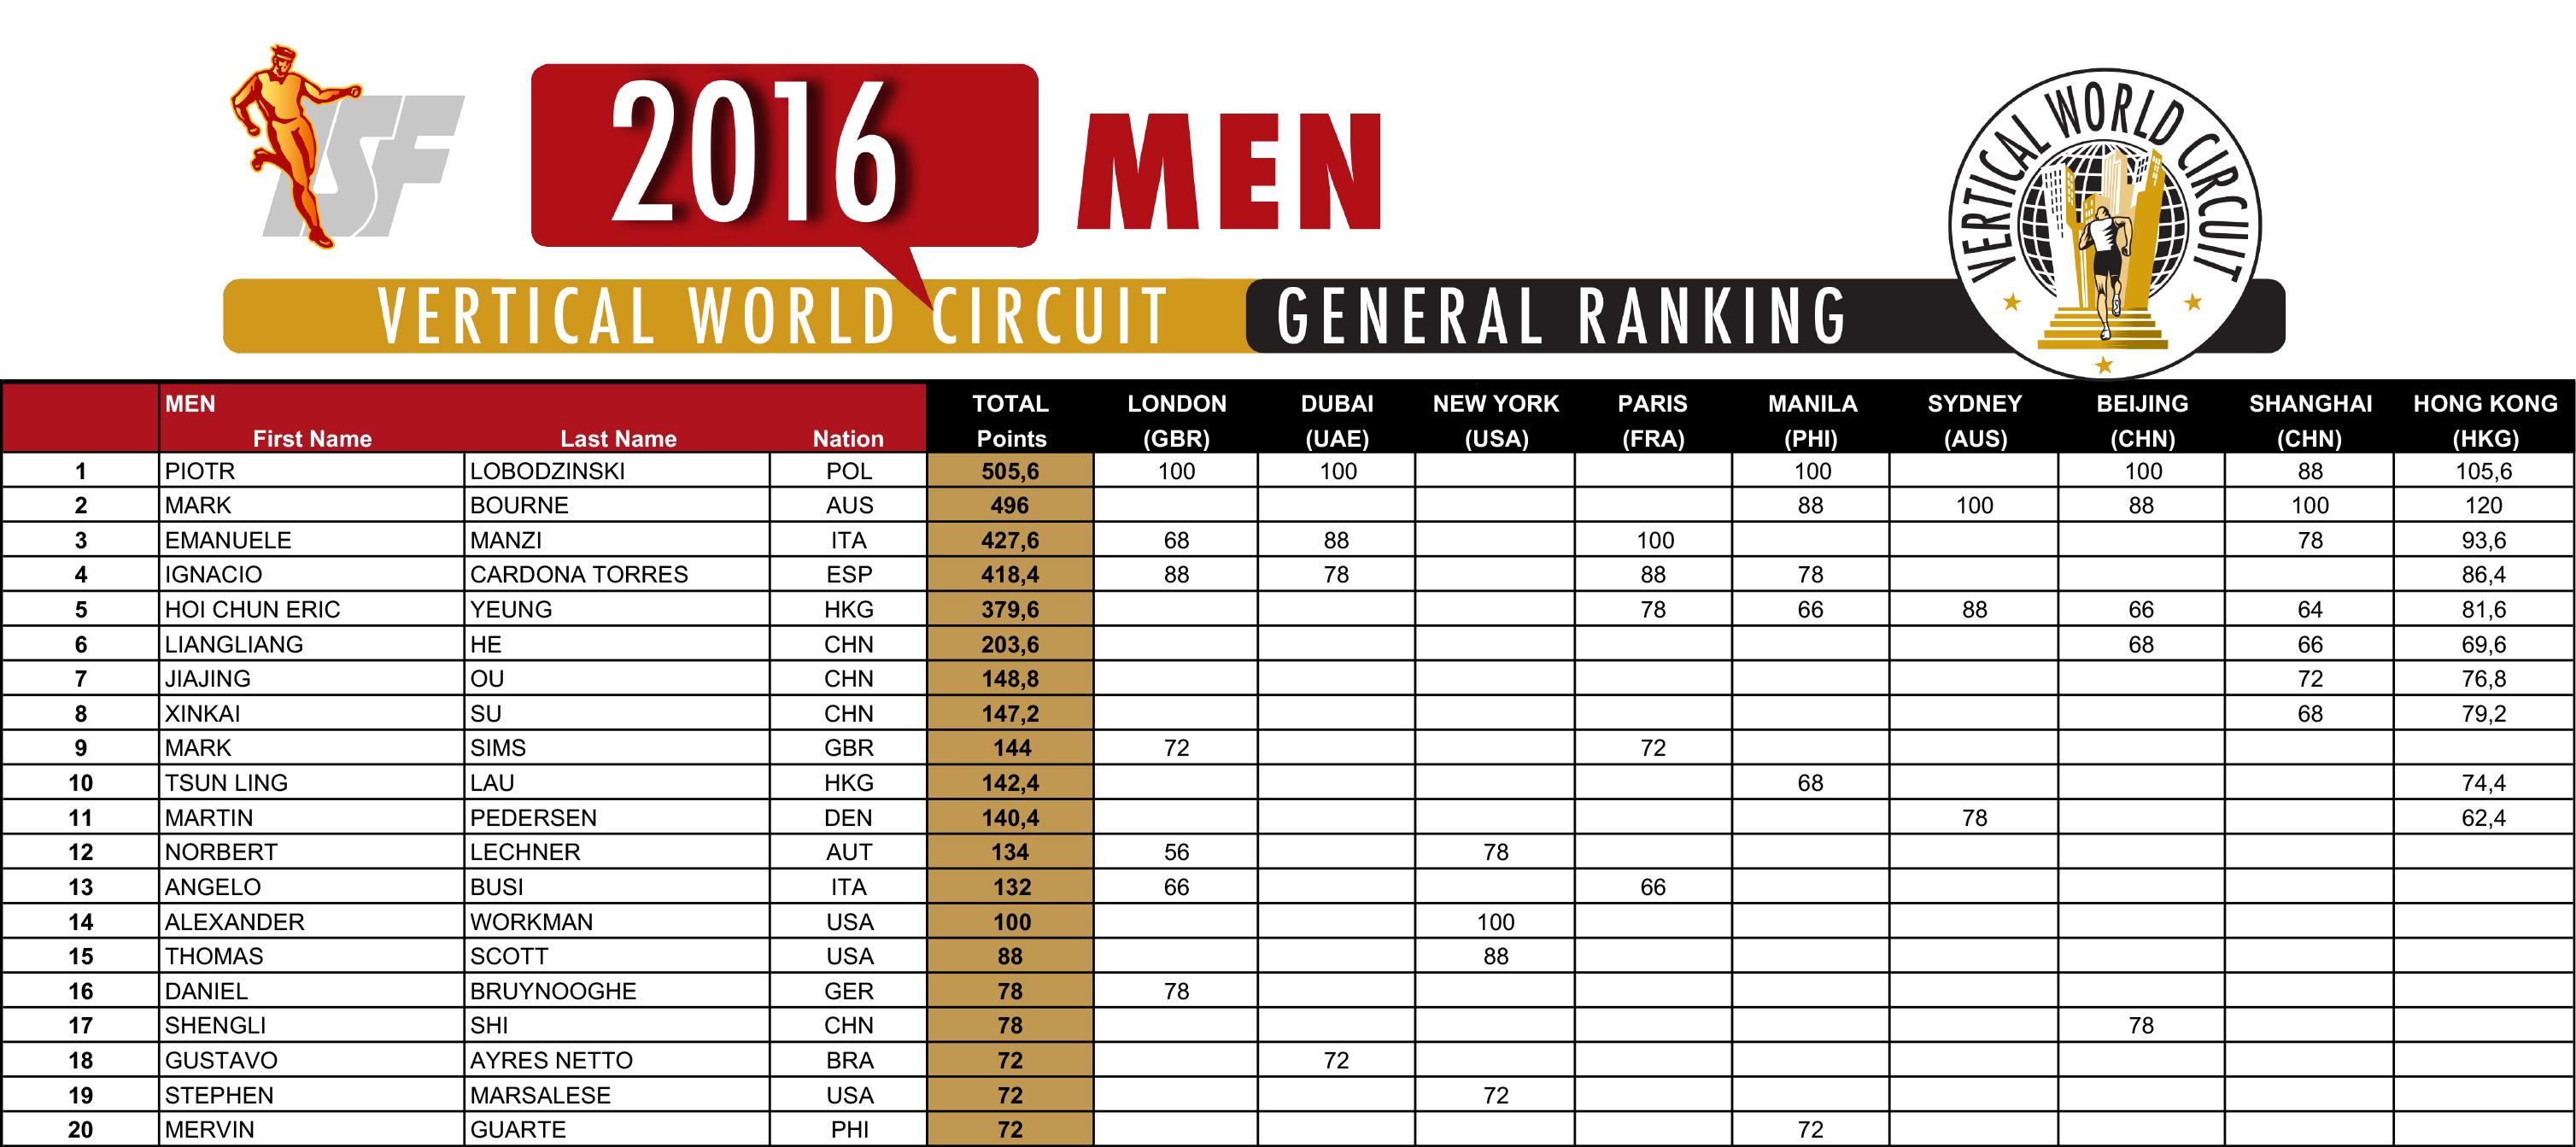 2016-vwc-ranking_men-04-12